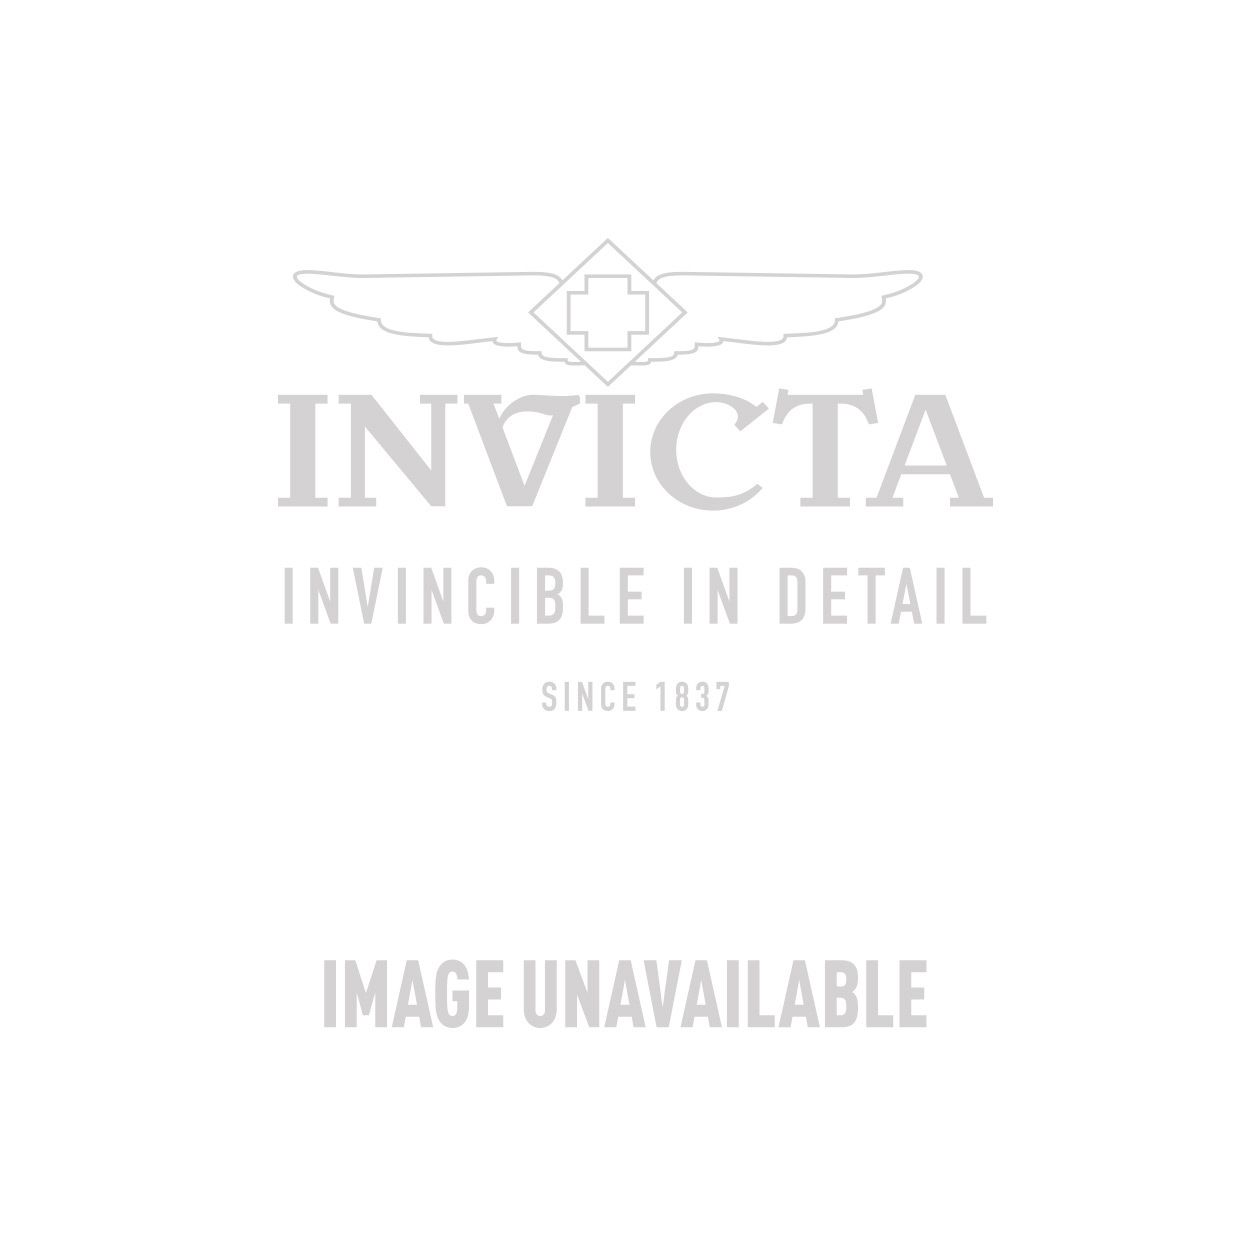 Invicta JT Swiss Made Quartz Watch - Black, Blue case with Black tone Silicone band - Model 17825